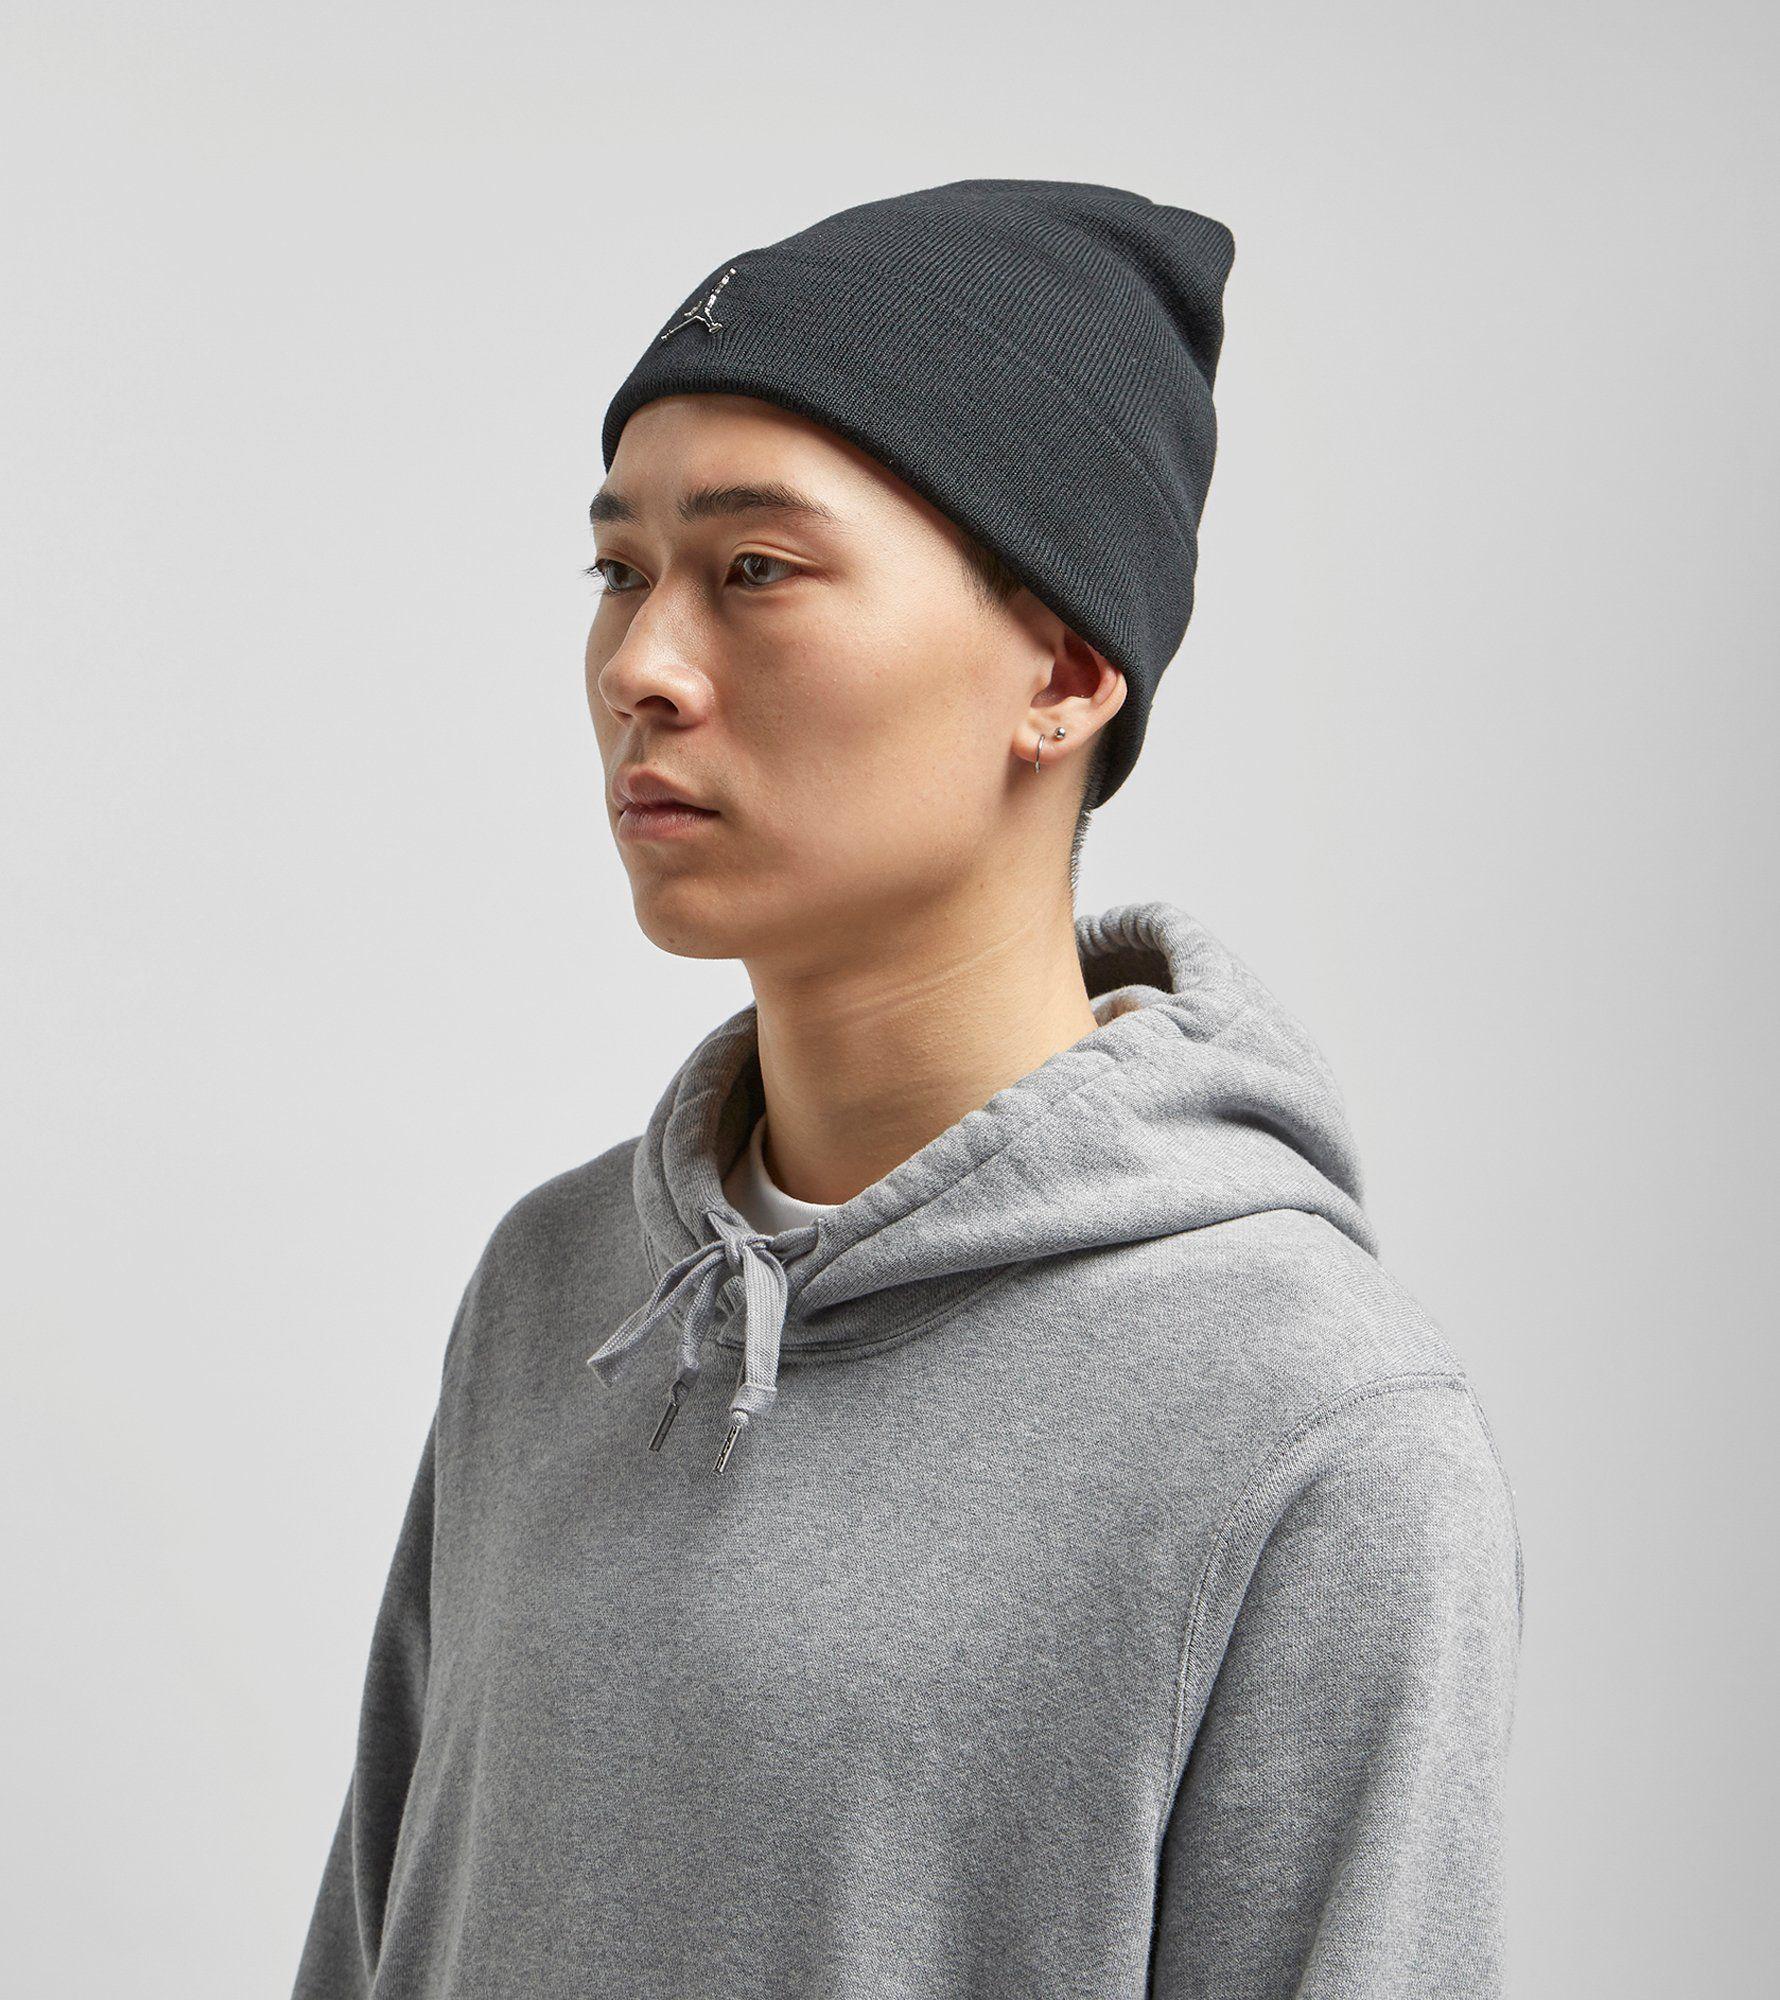 Jordan Metal Beanie Hat